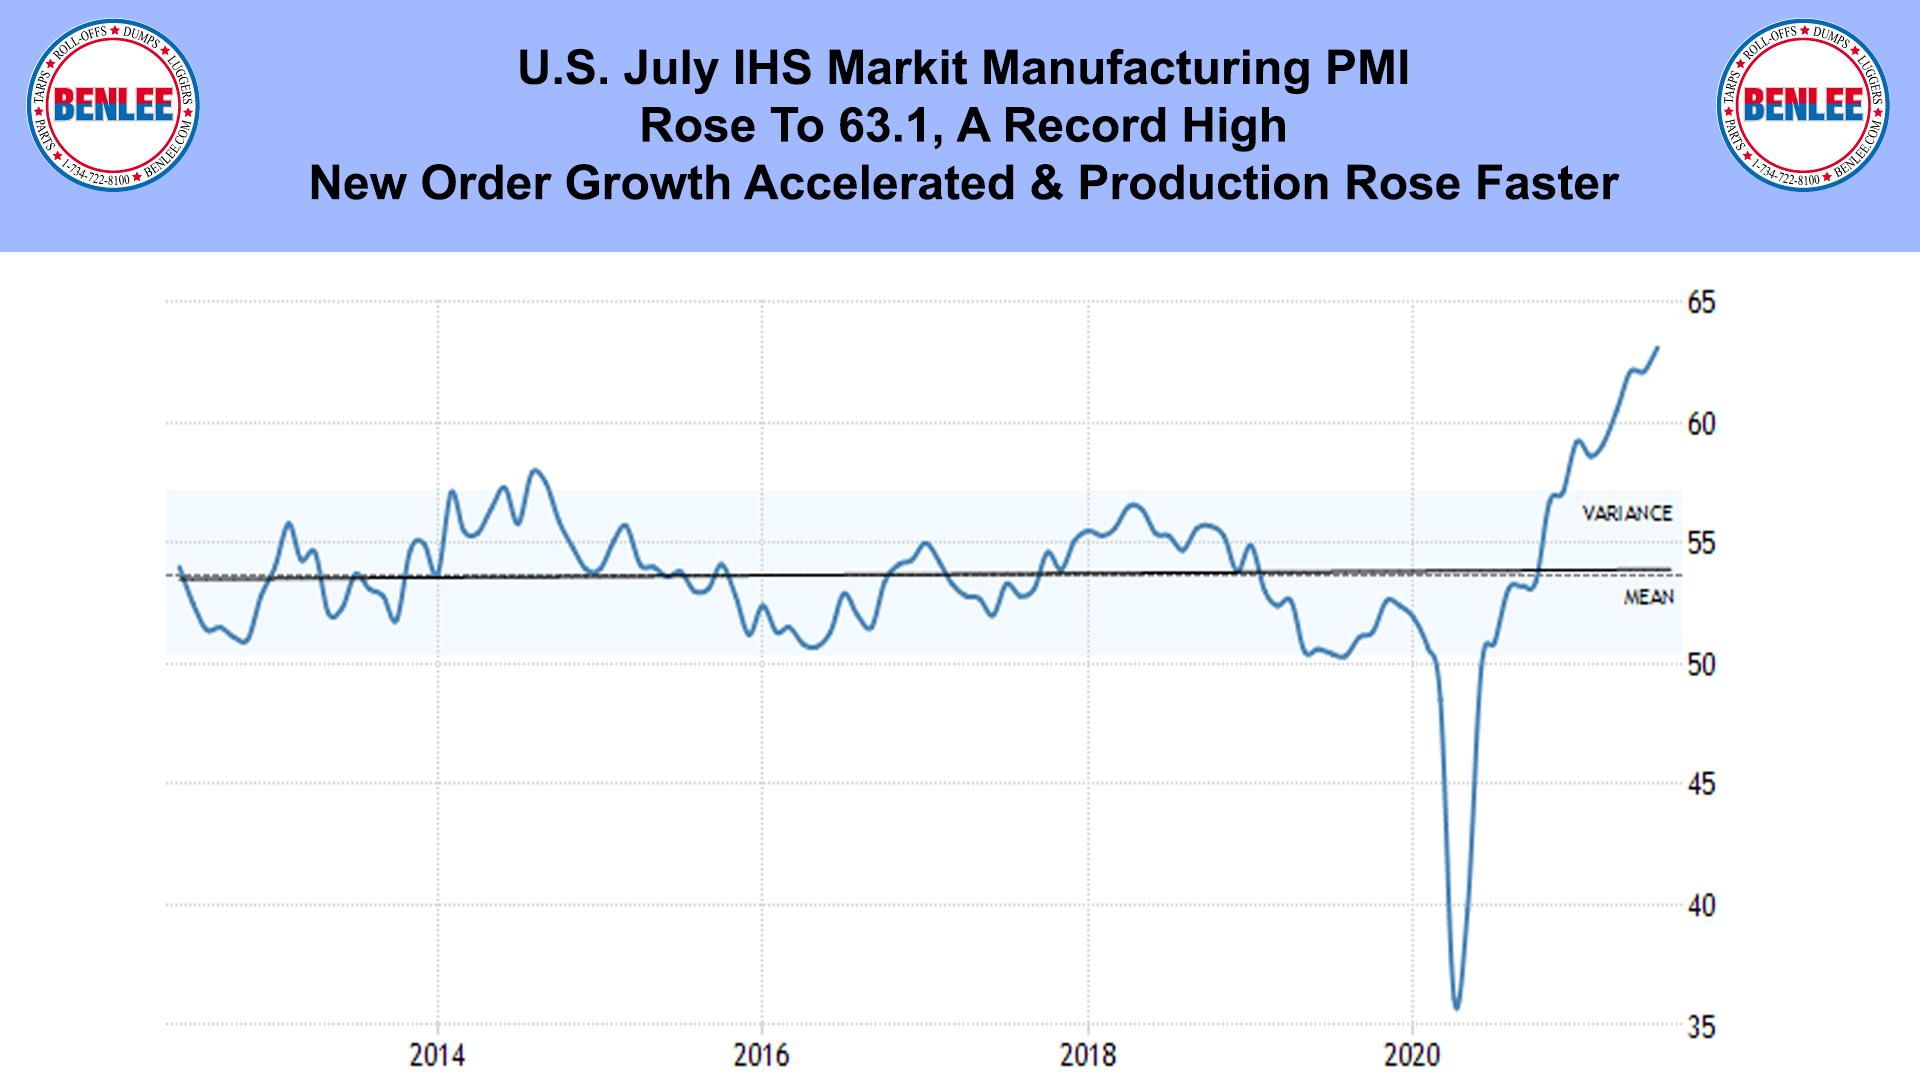 U.S. July IHS Markit Manufacturing PMI